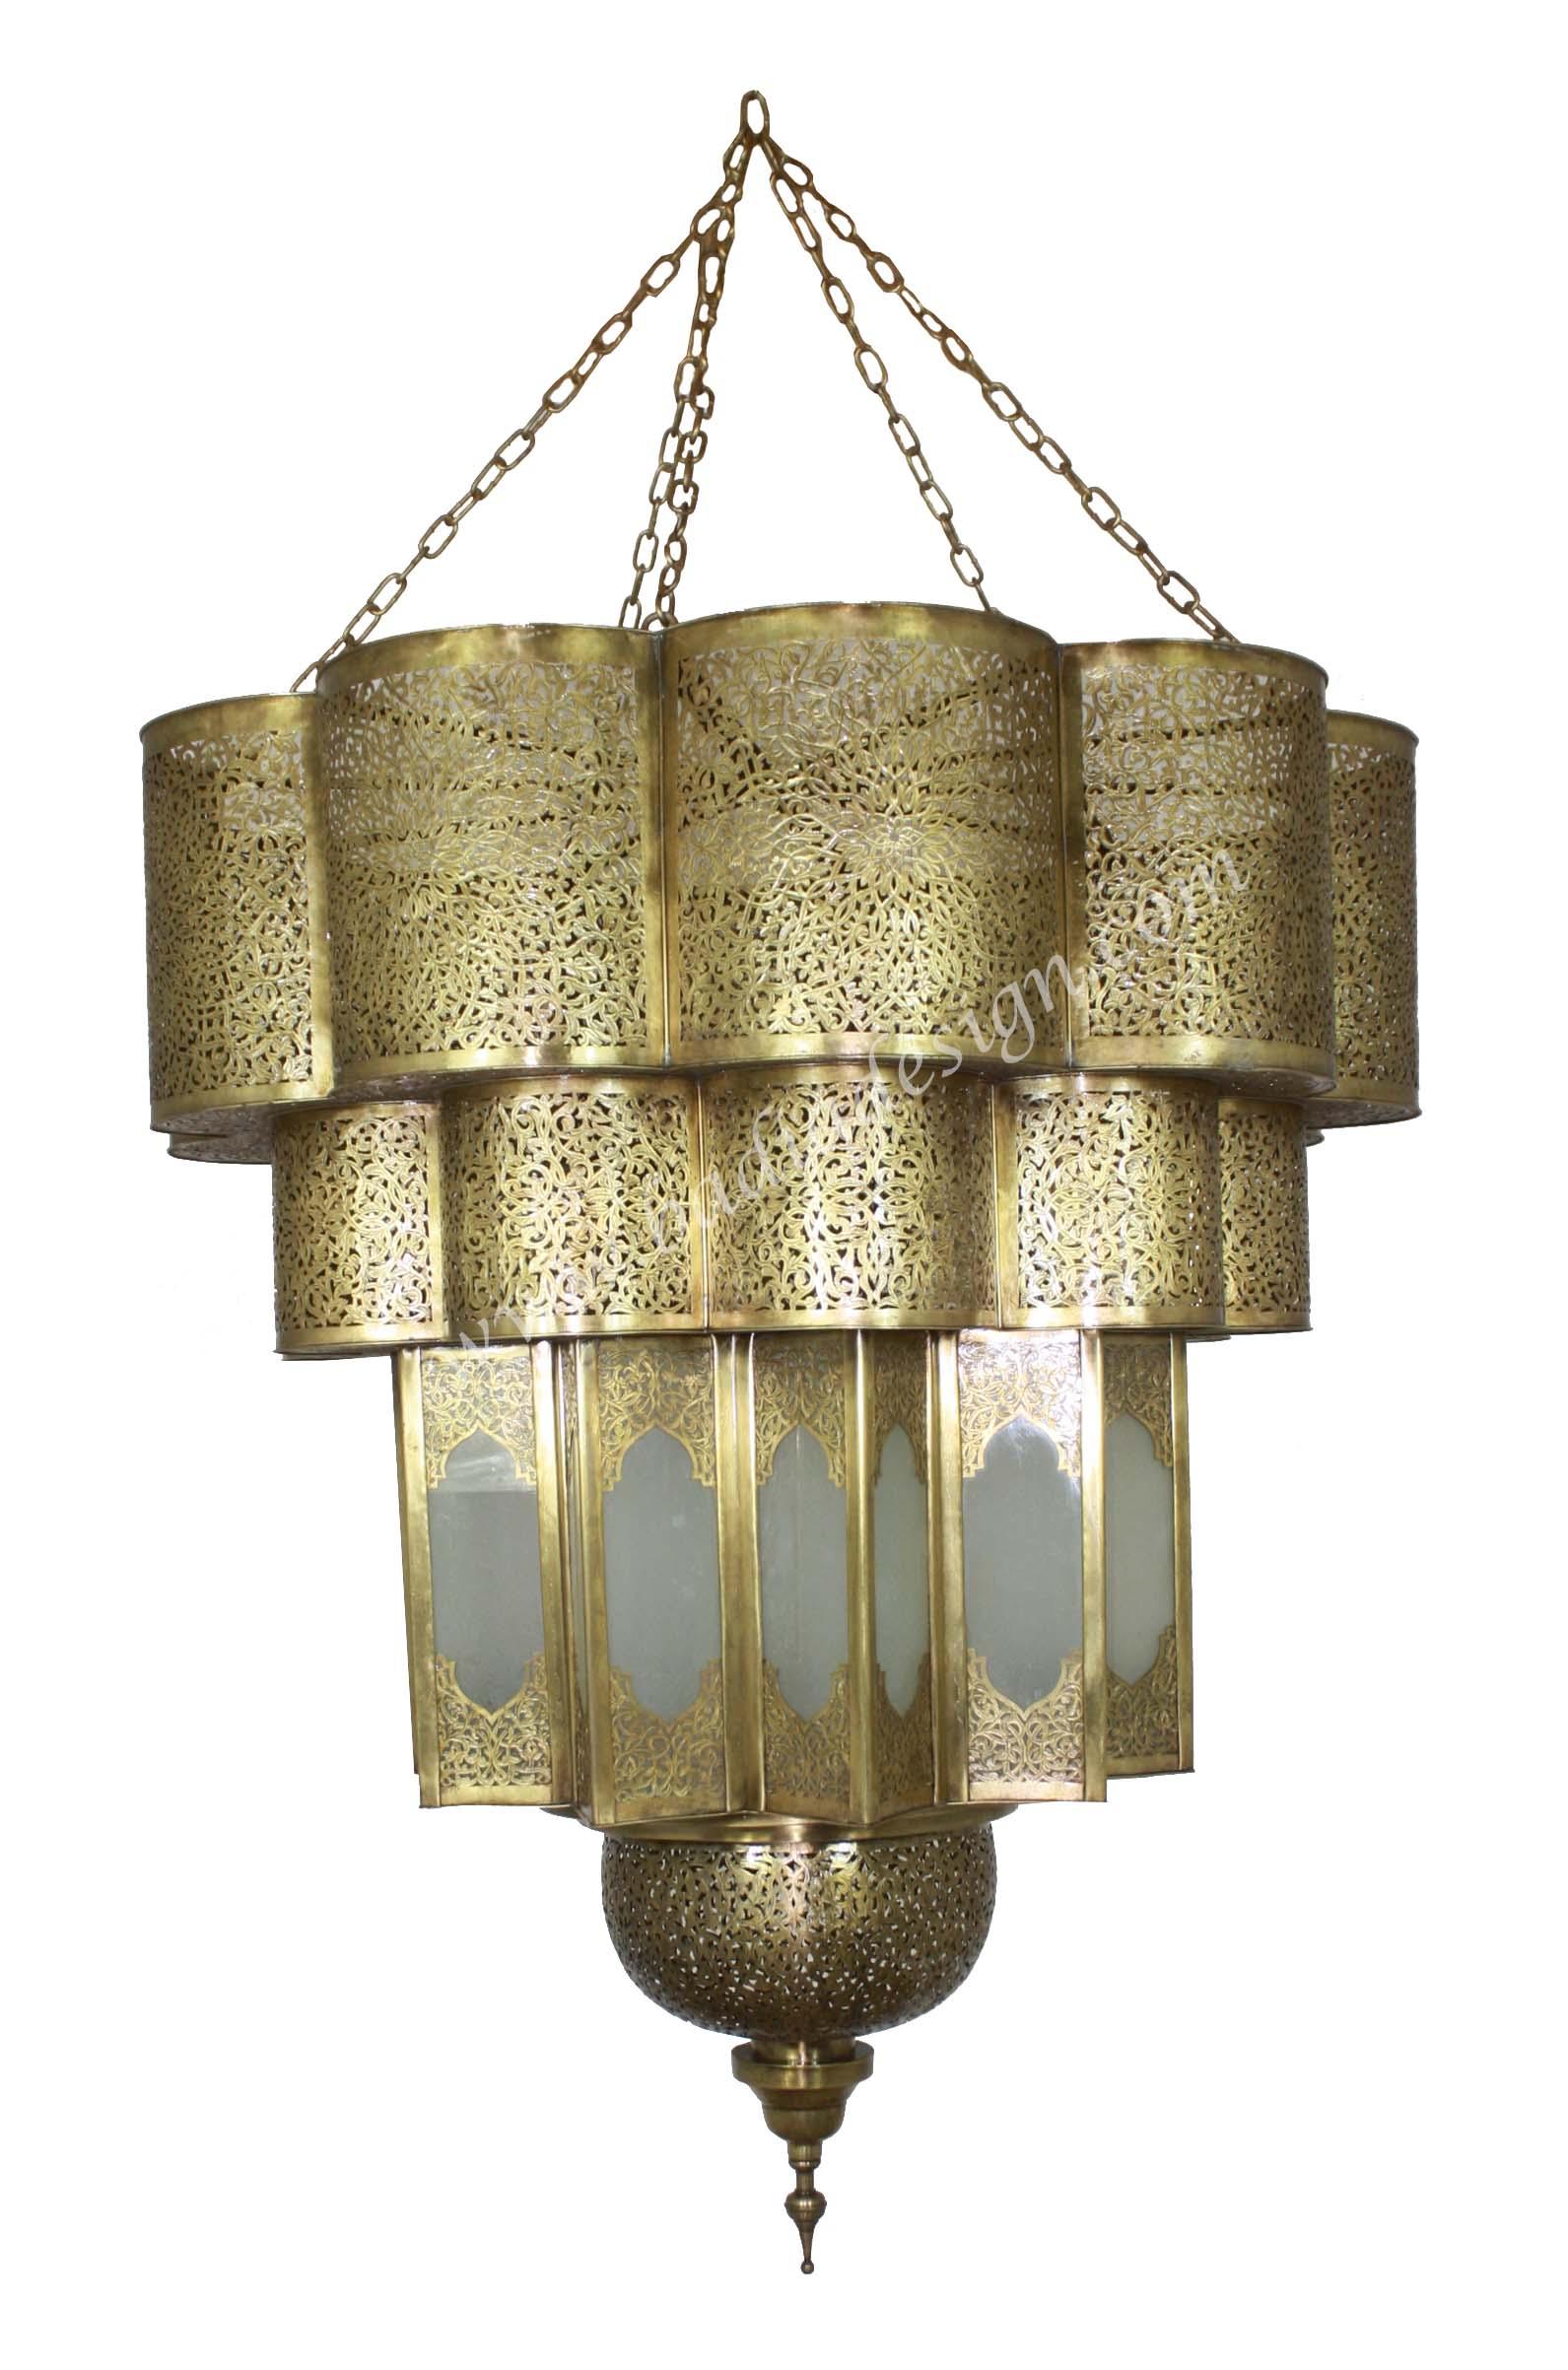 large-moroccan-brass-chandelier-ch235-1.jpg